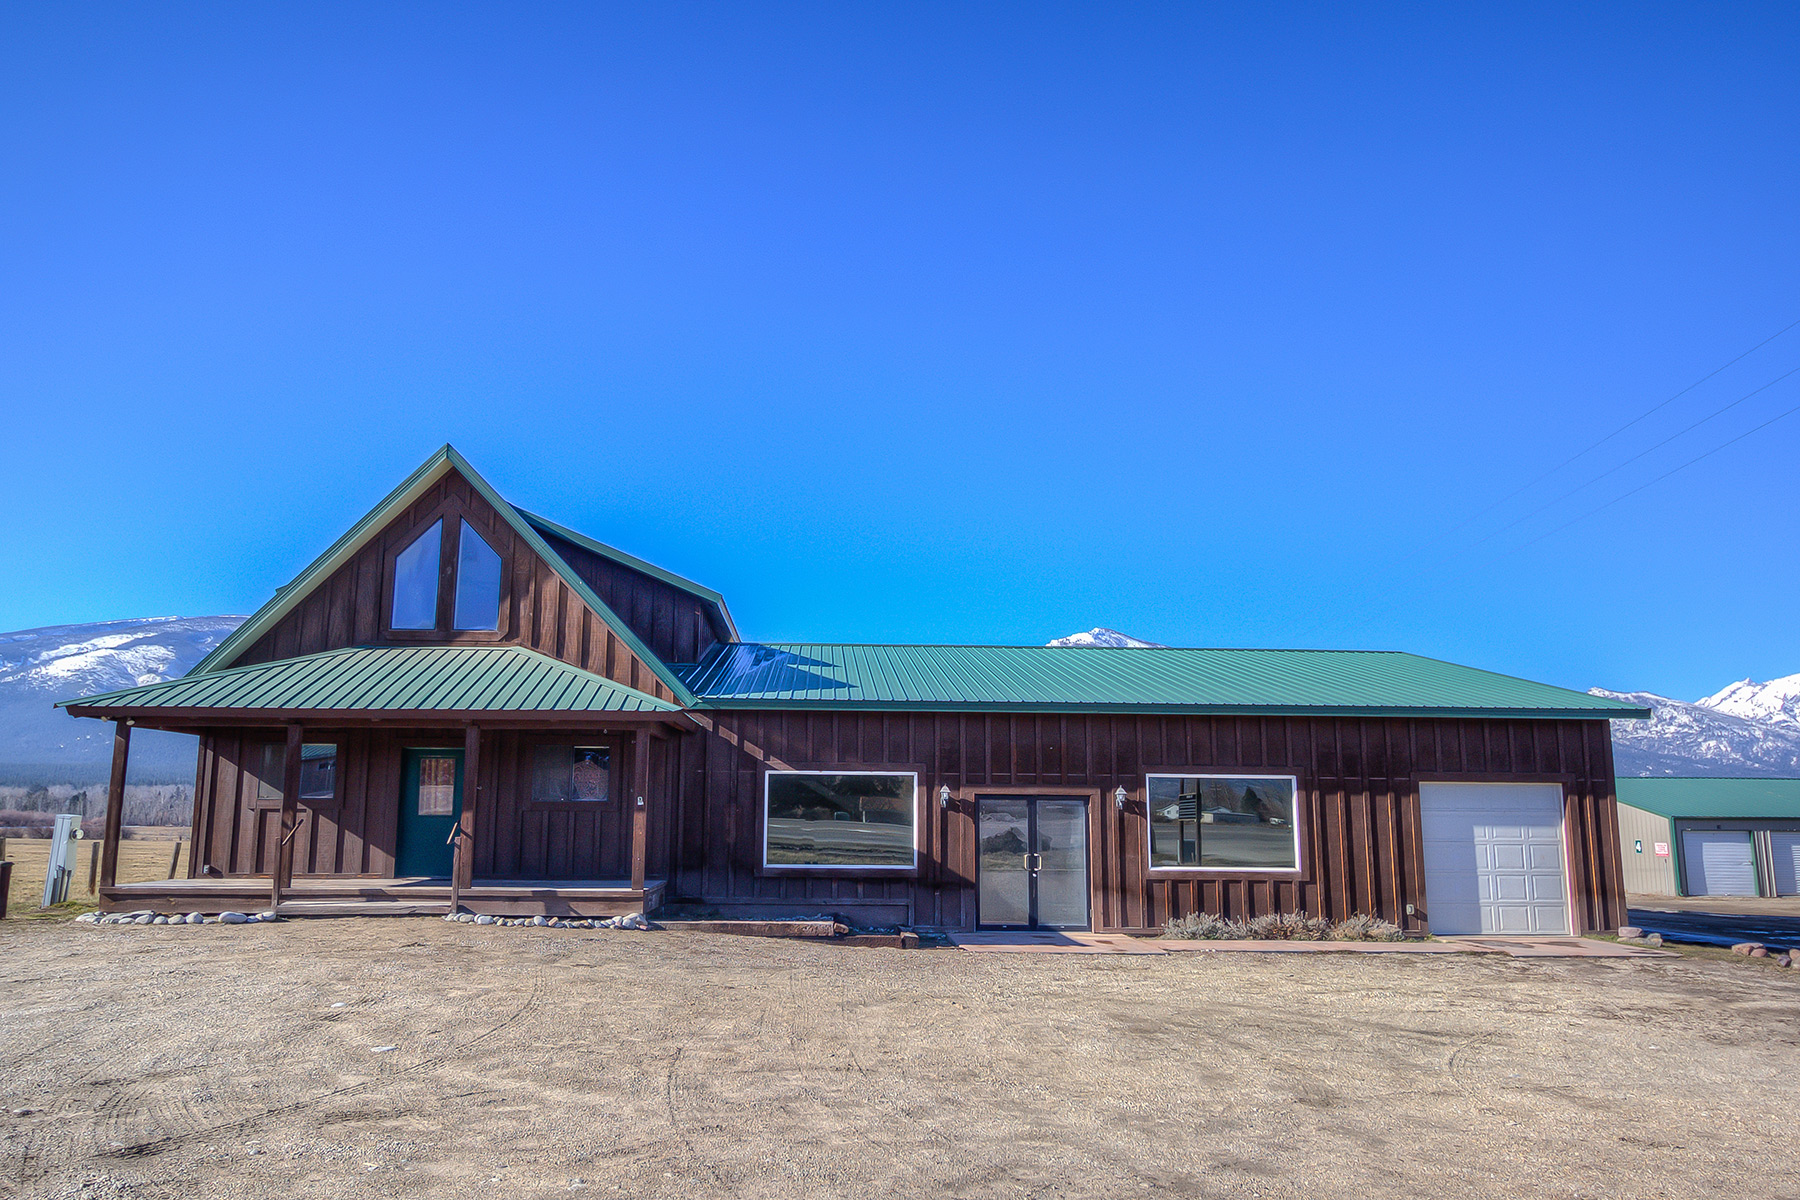 Single Family Home for Sale at 99 Lost Lamb Lane Hamilton, Montana, 59840 United States